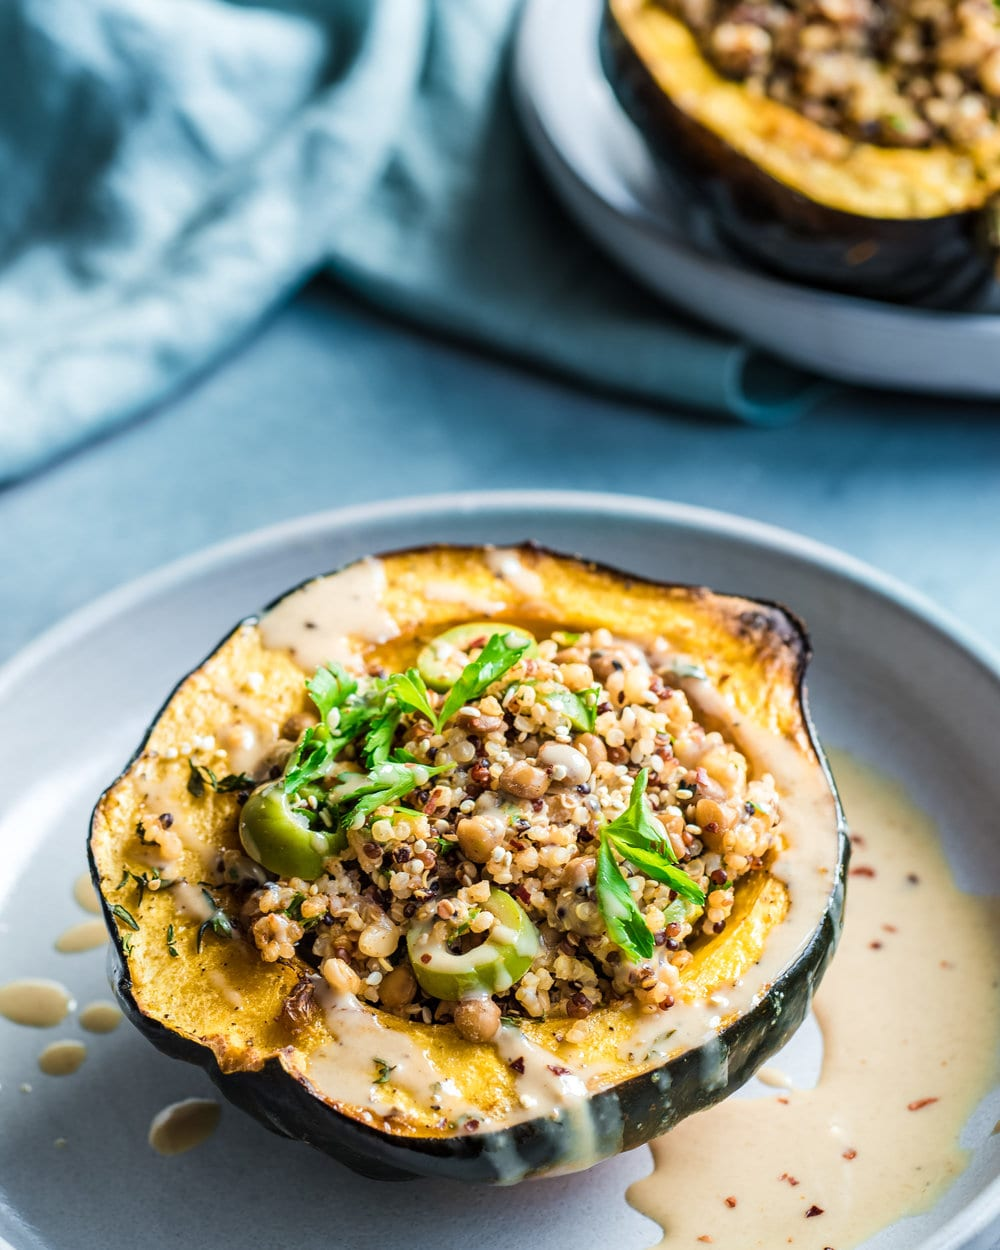 Low FODMAP Quinoa-Stuffed Acorn Squash